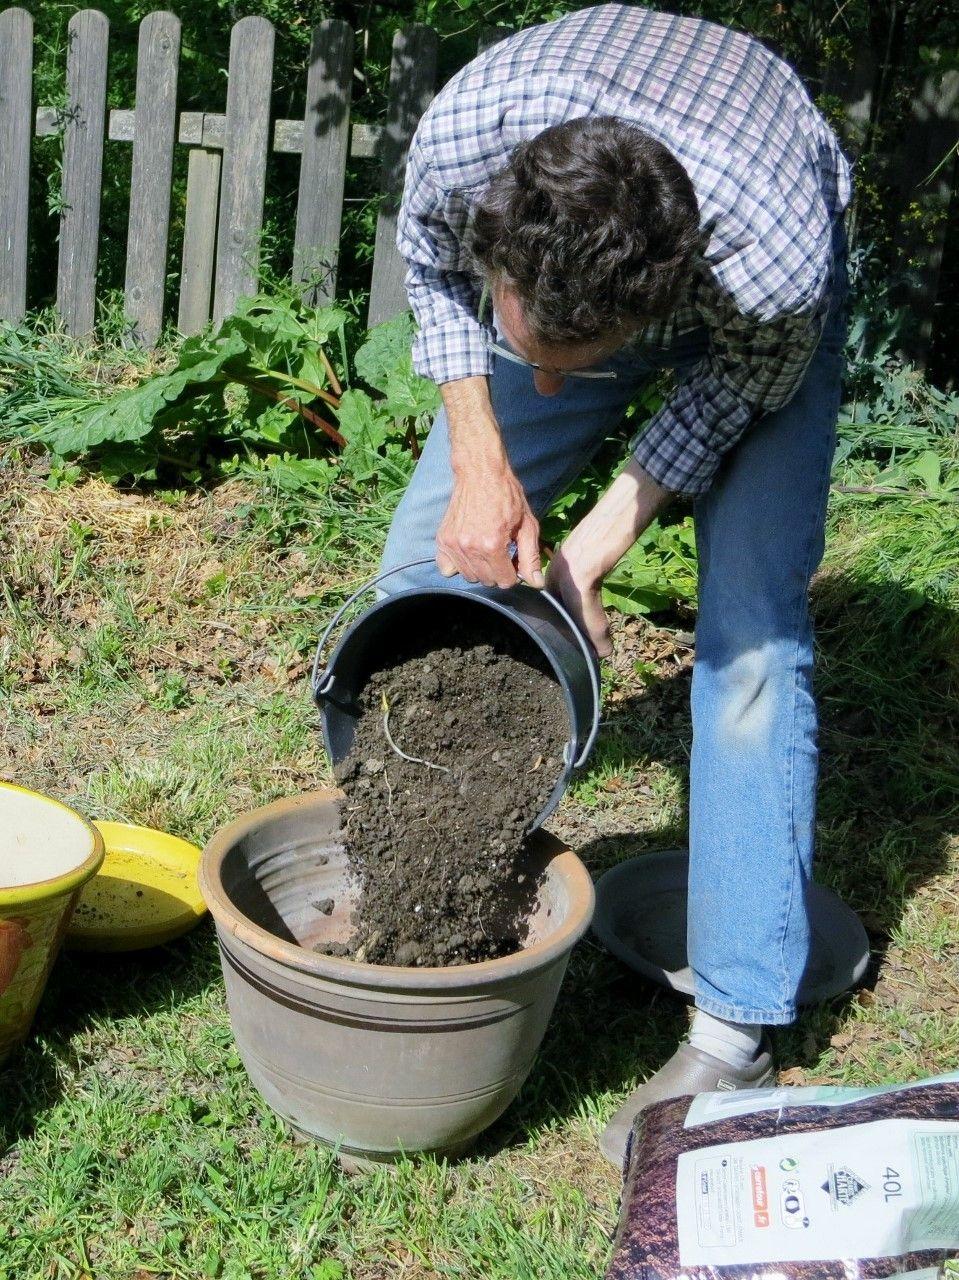 Planter Des Tomates En Pot ma culture de tomates en pots | culture tomate, jardinage en